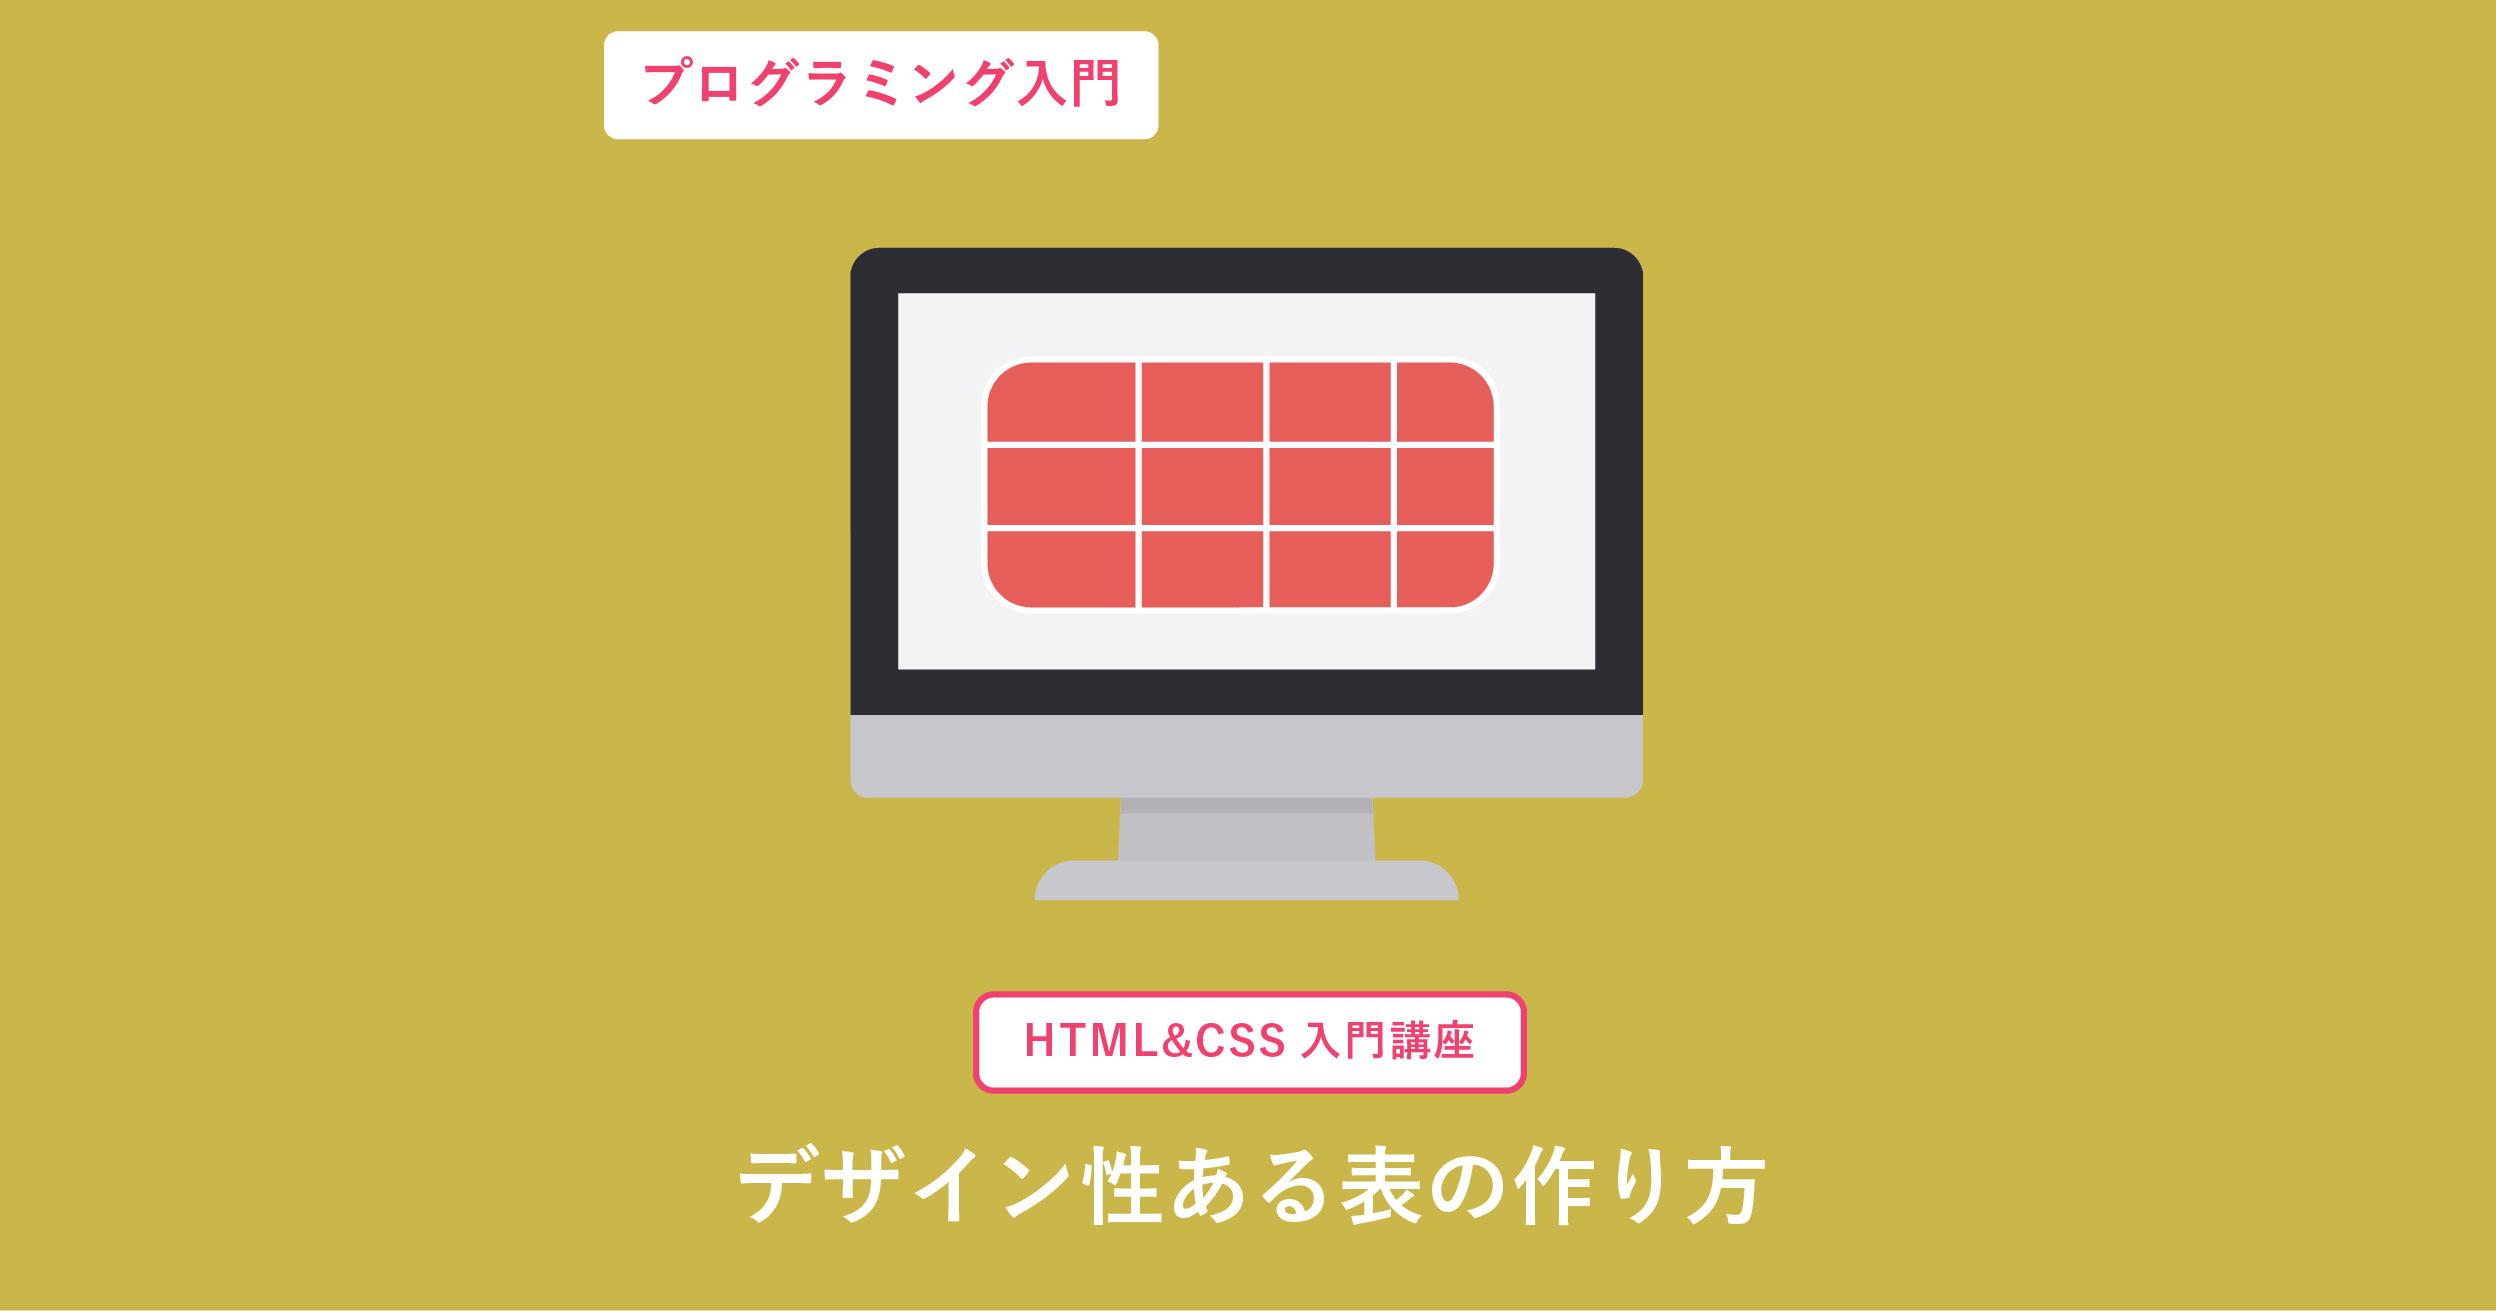 HTML tableで表作成する方法【レイアウトの方法まで完全網羅】